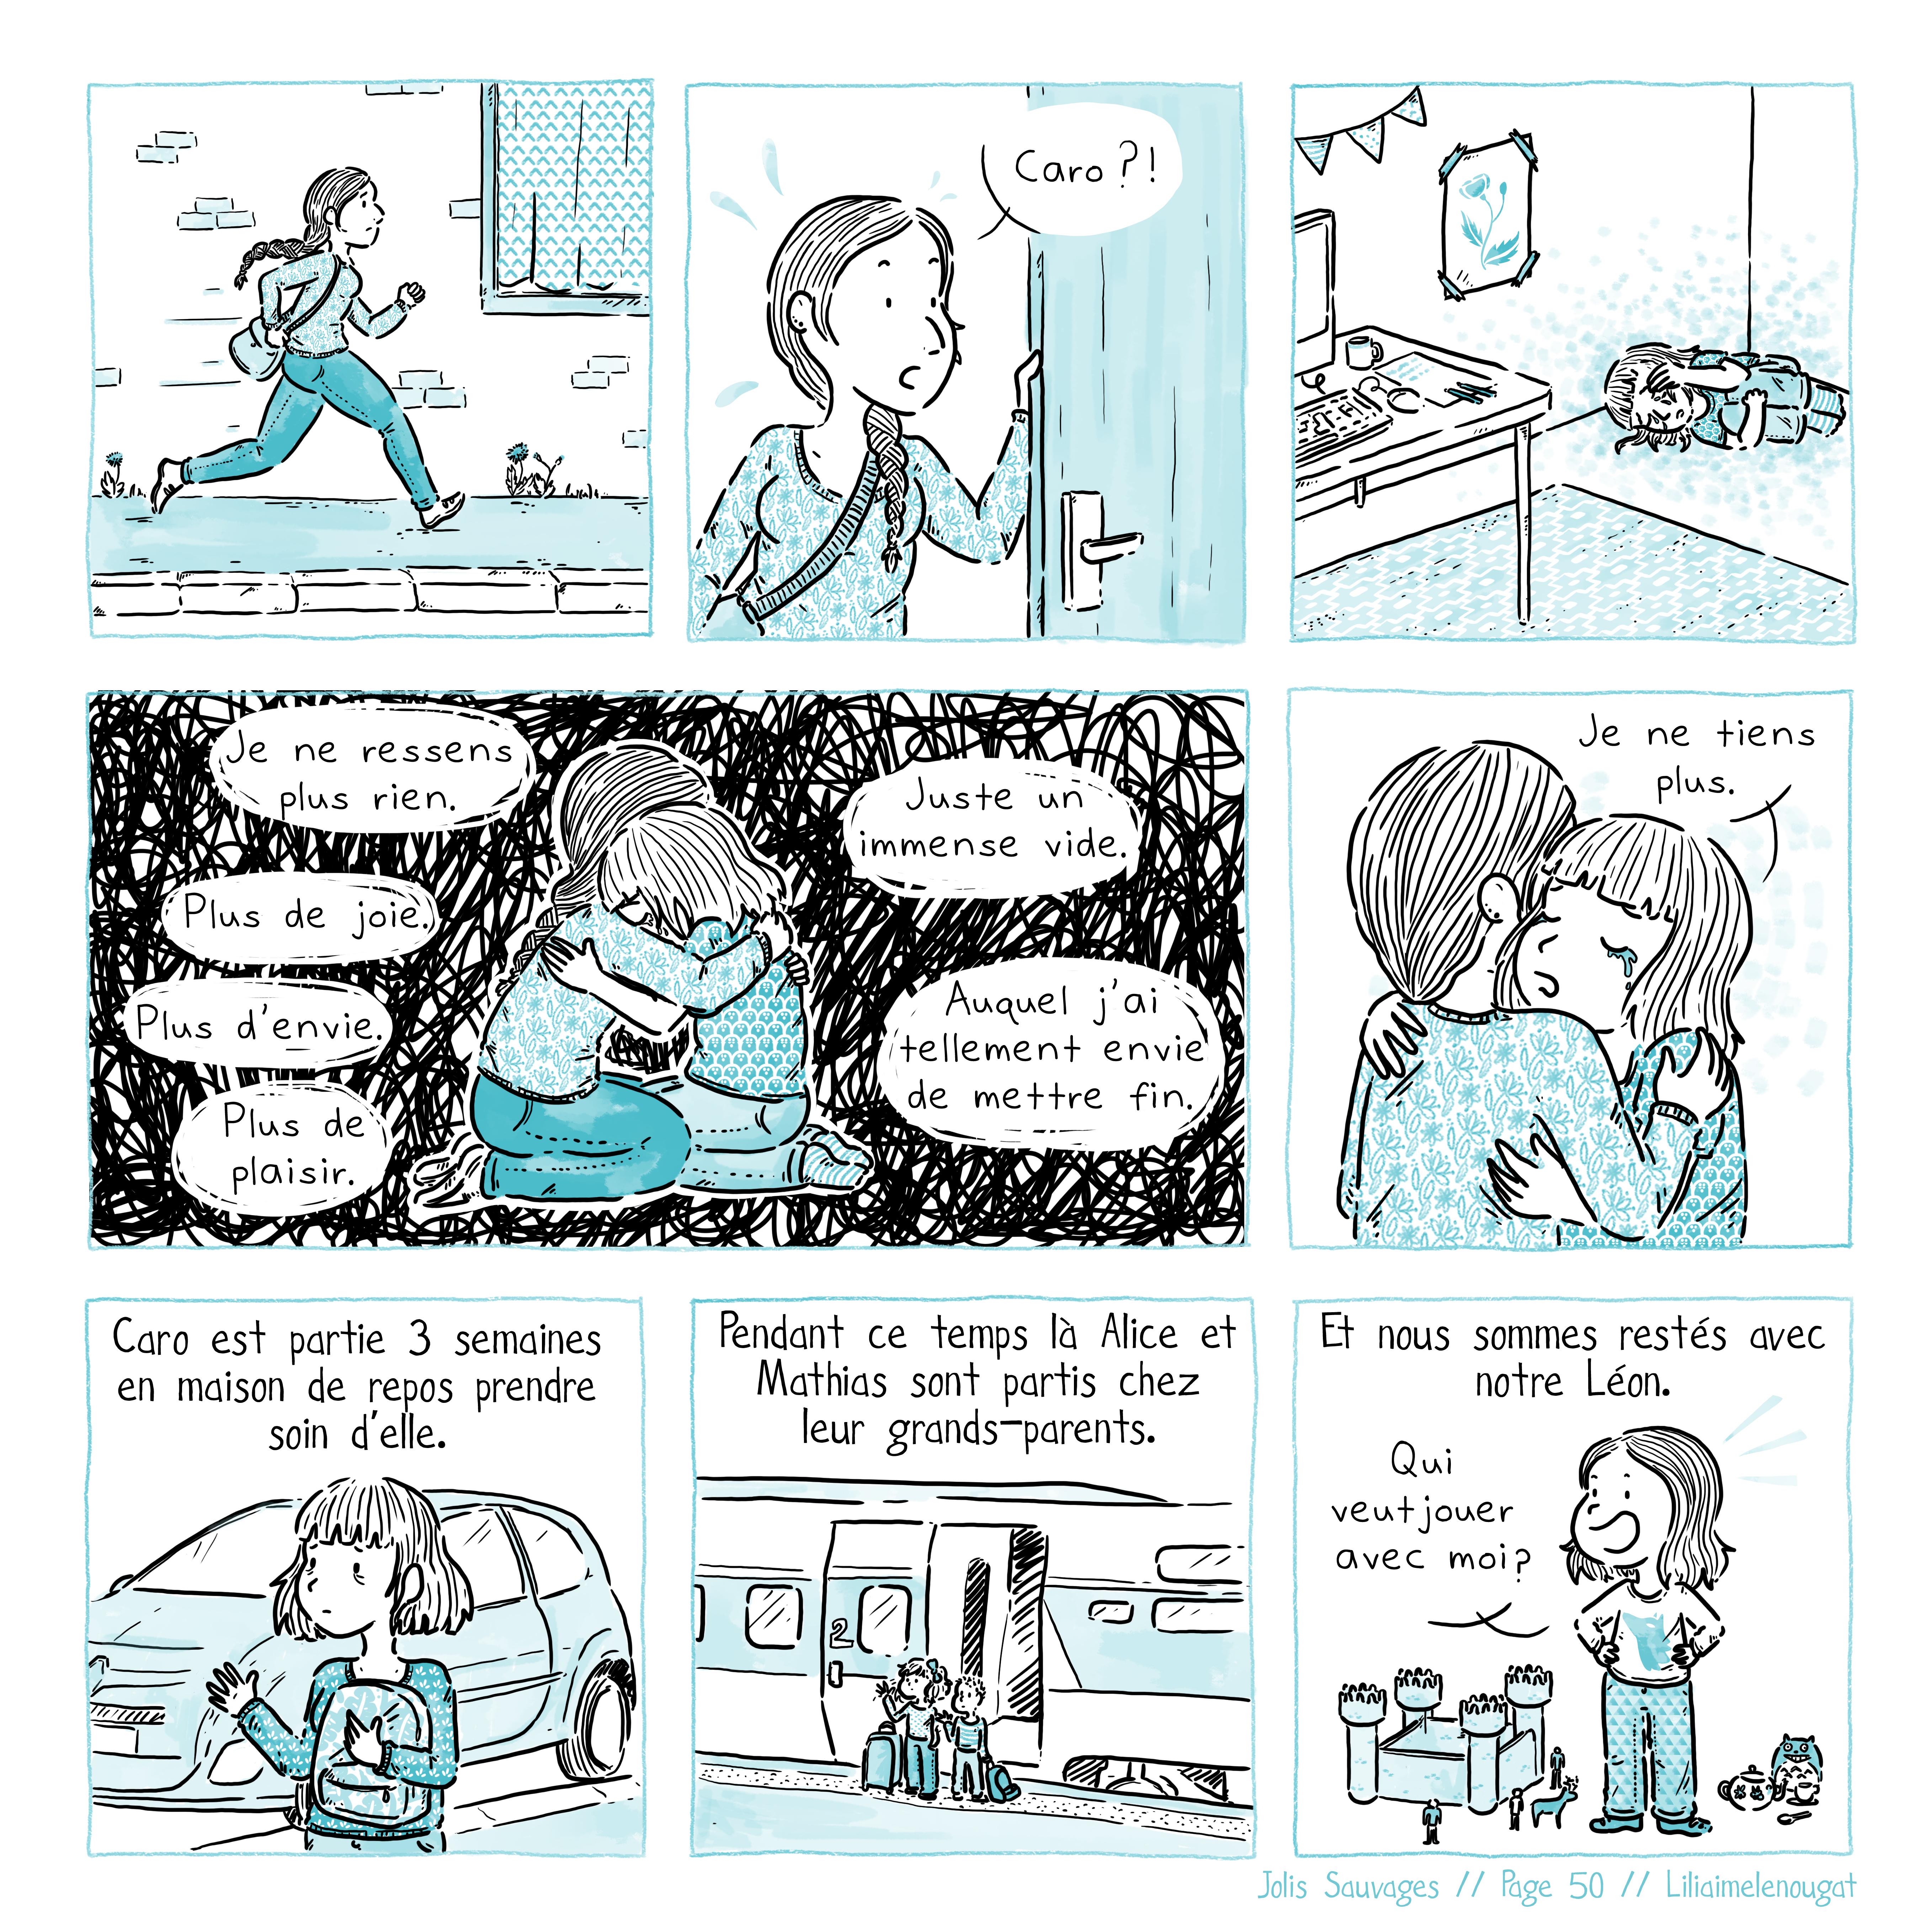 Page 50 - depression2.jpg